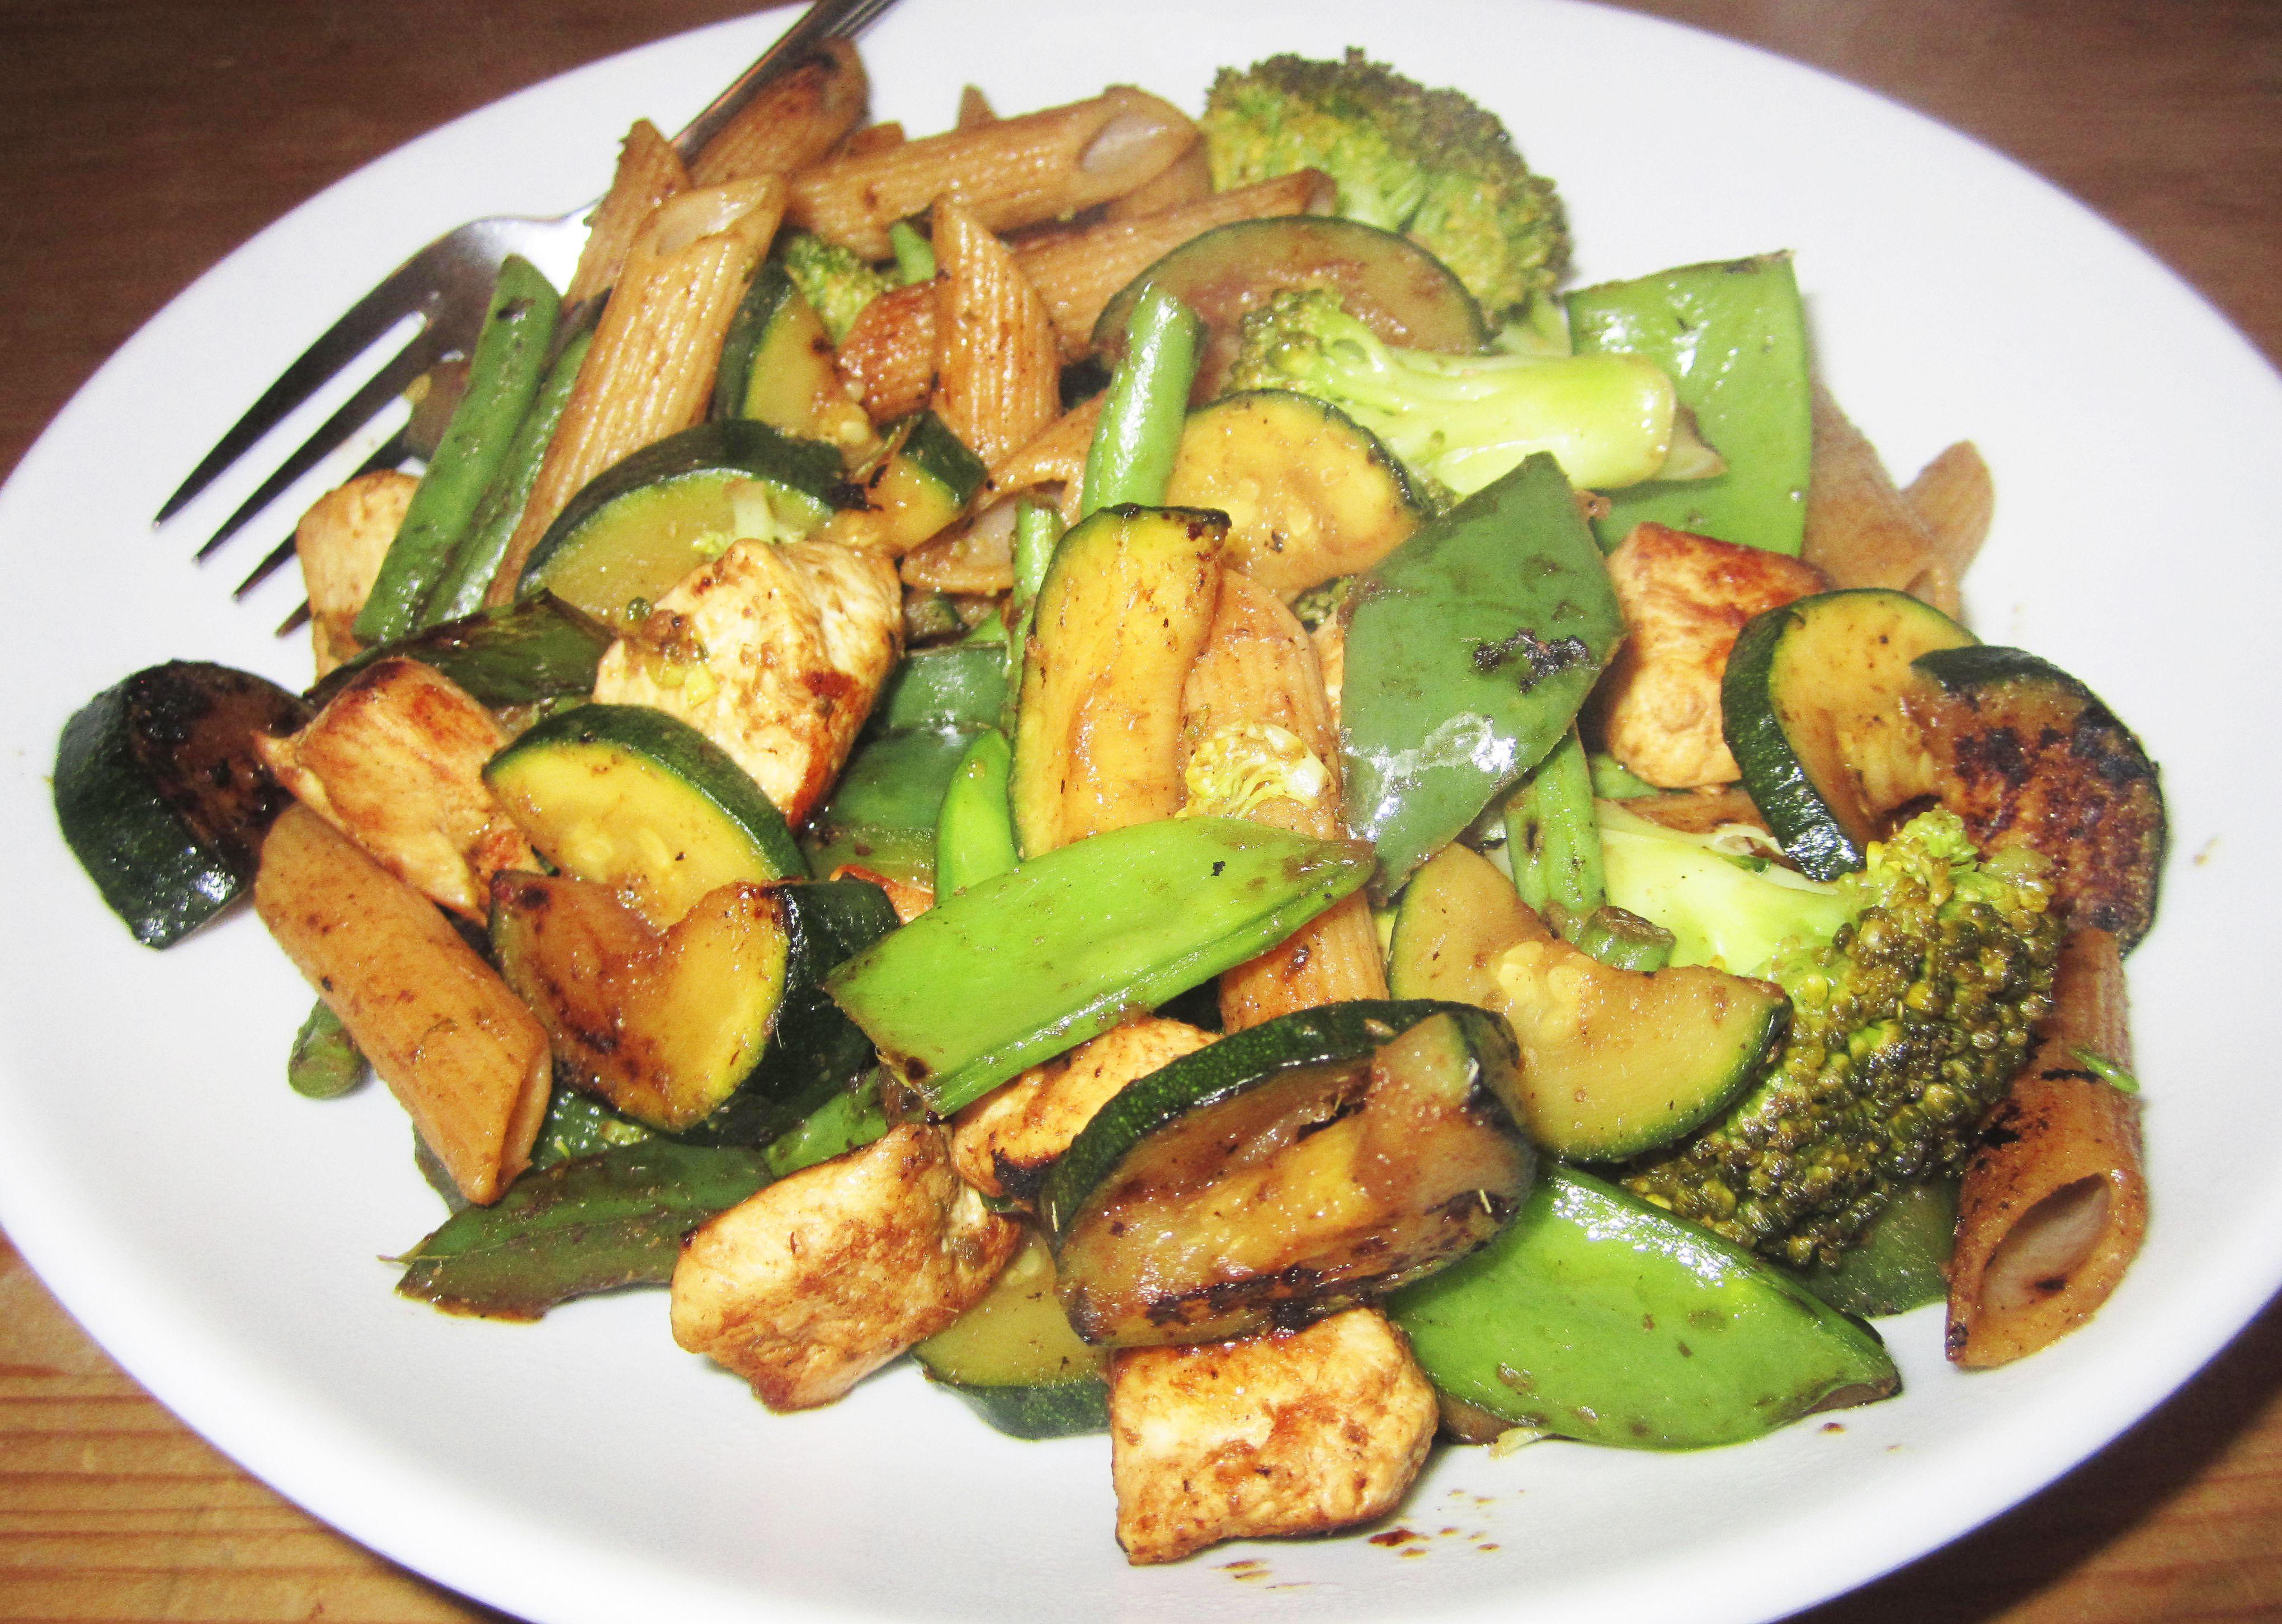 Easy Healthy Chicken Dinner Recipes  Quick chicken dinner recipes healthy Food chicken recipes